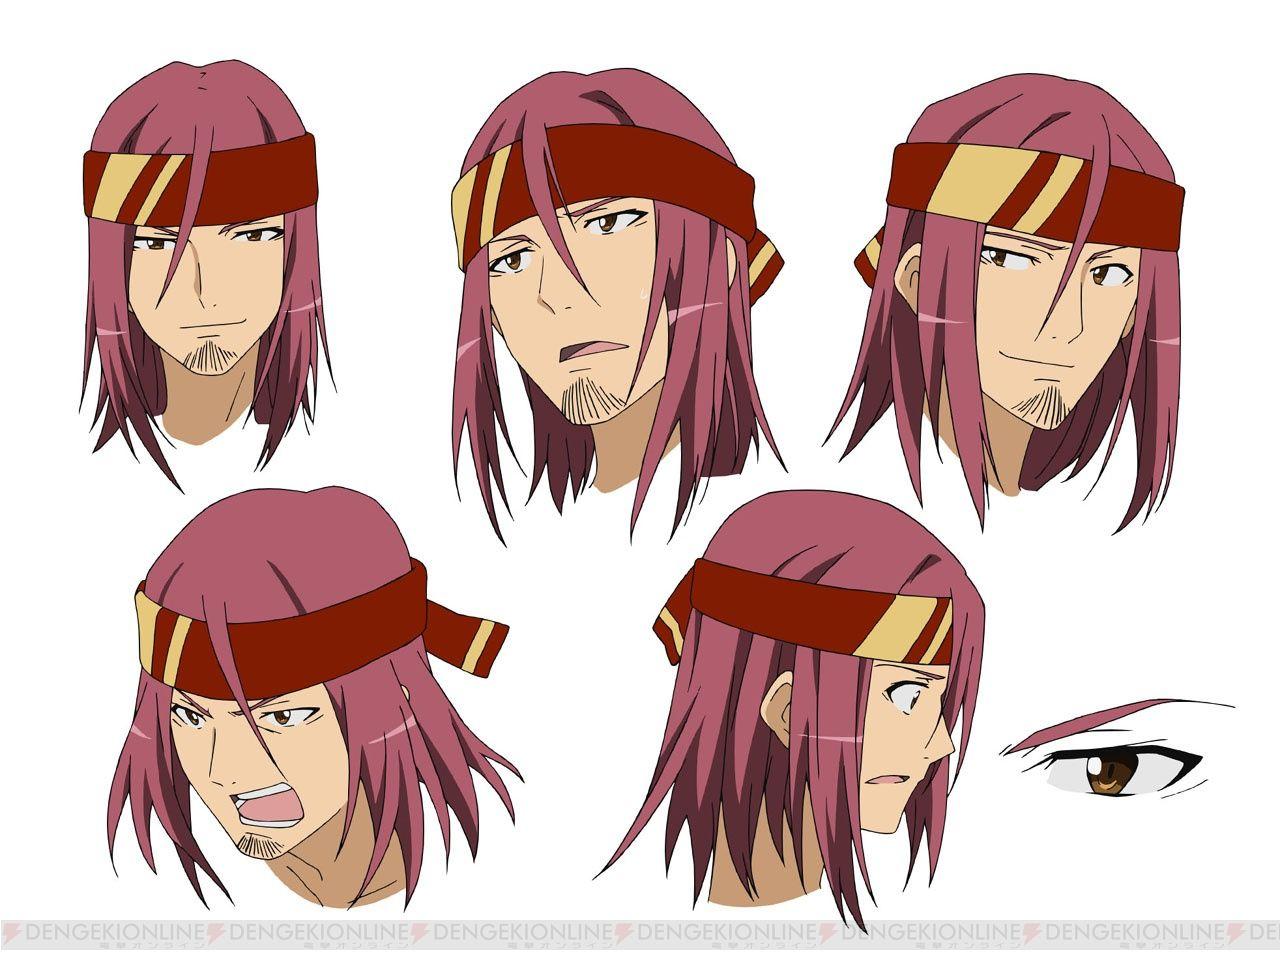 Klein (Face/Hair) Sword Art Online Sword art online